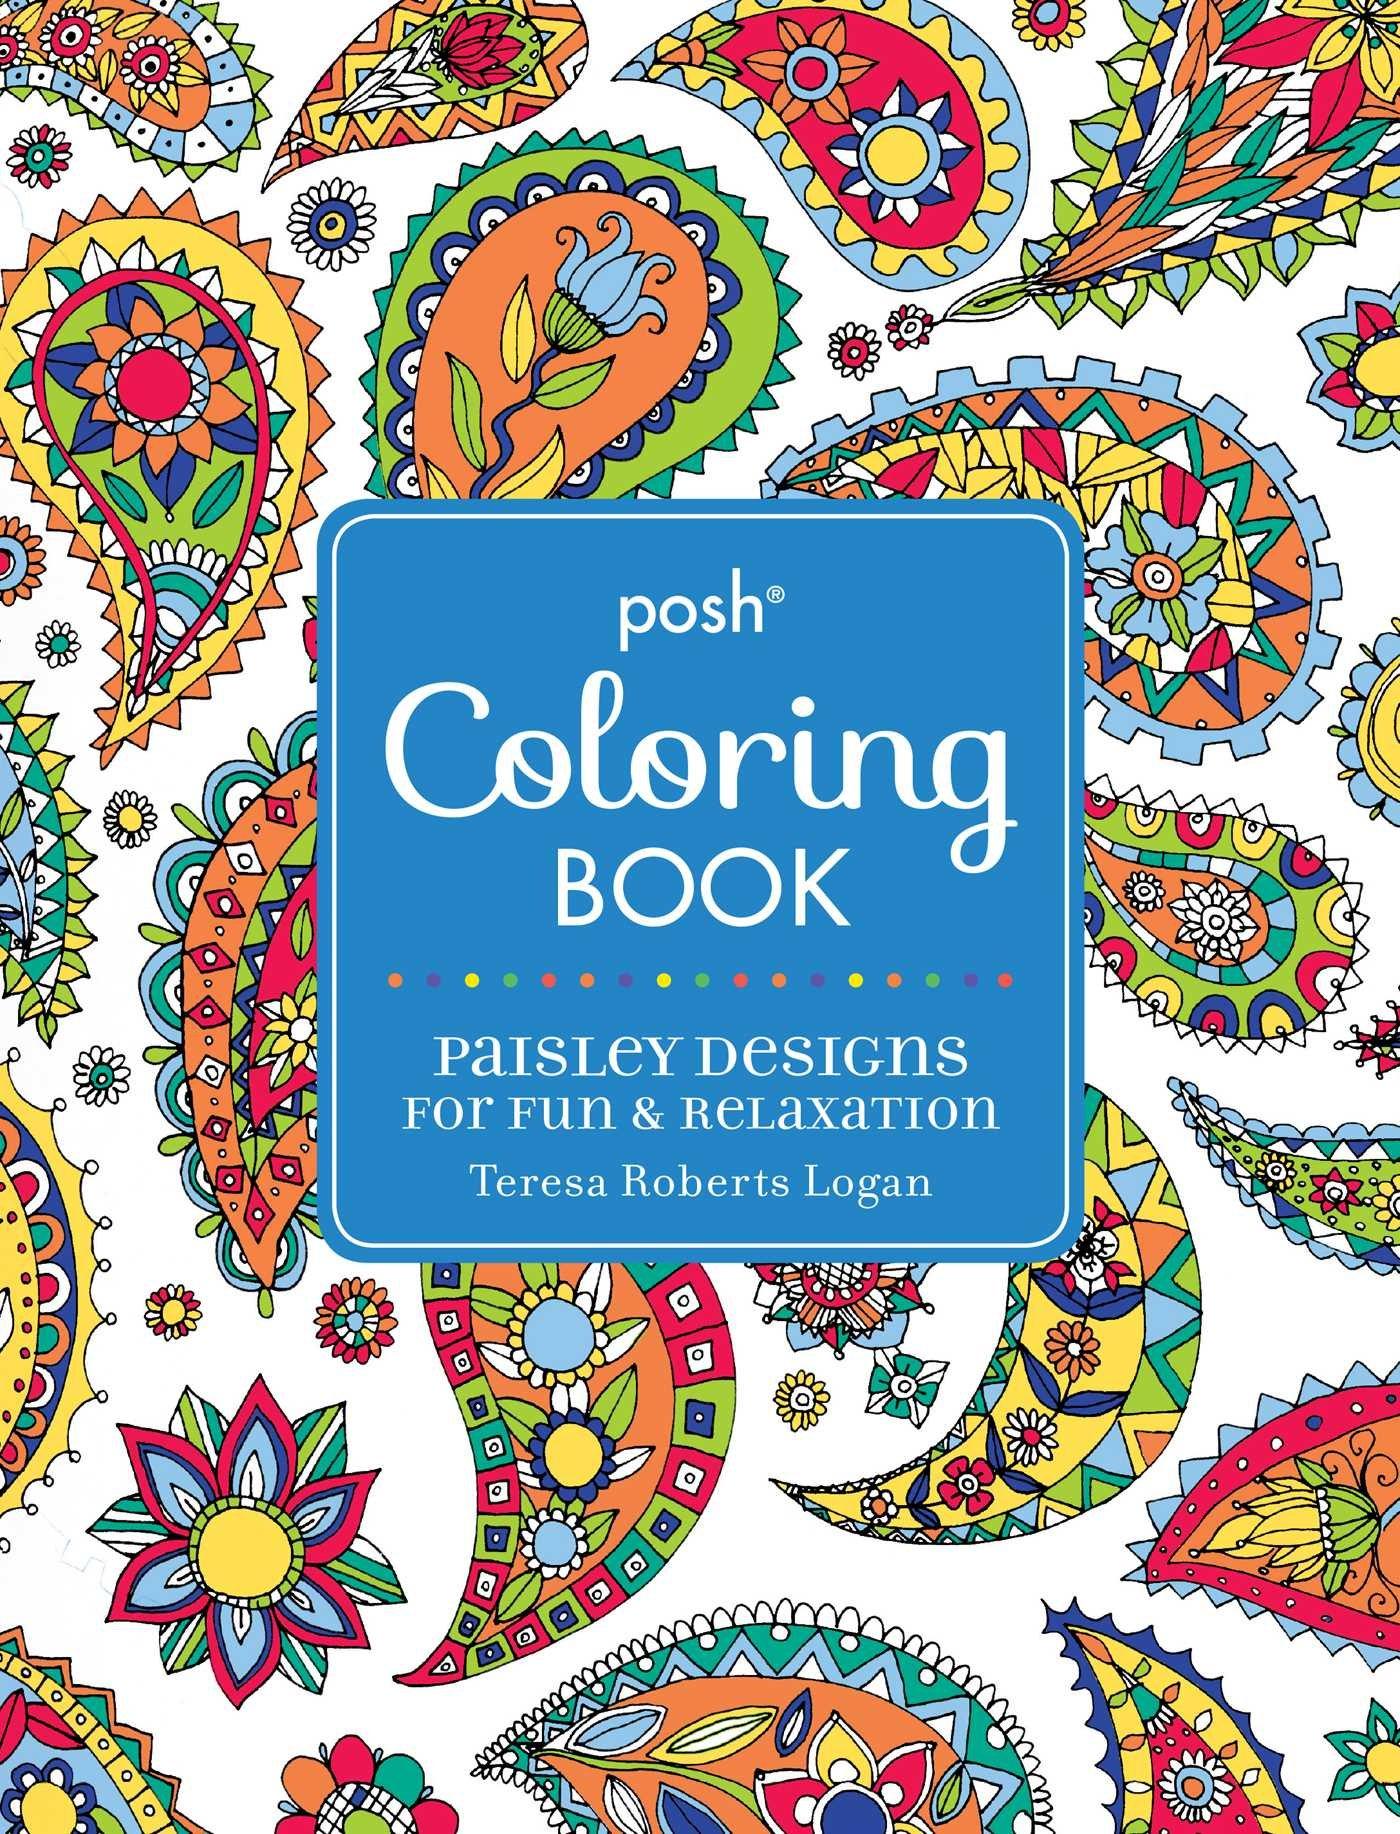 ComicsDC: Teresa Logan's coloring book available for pre-order